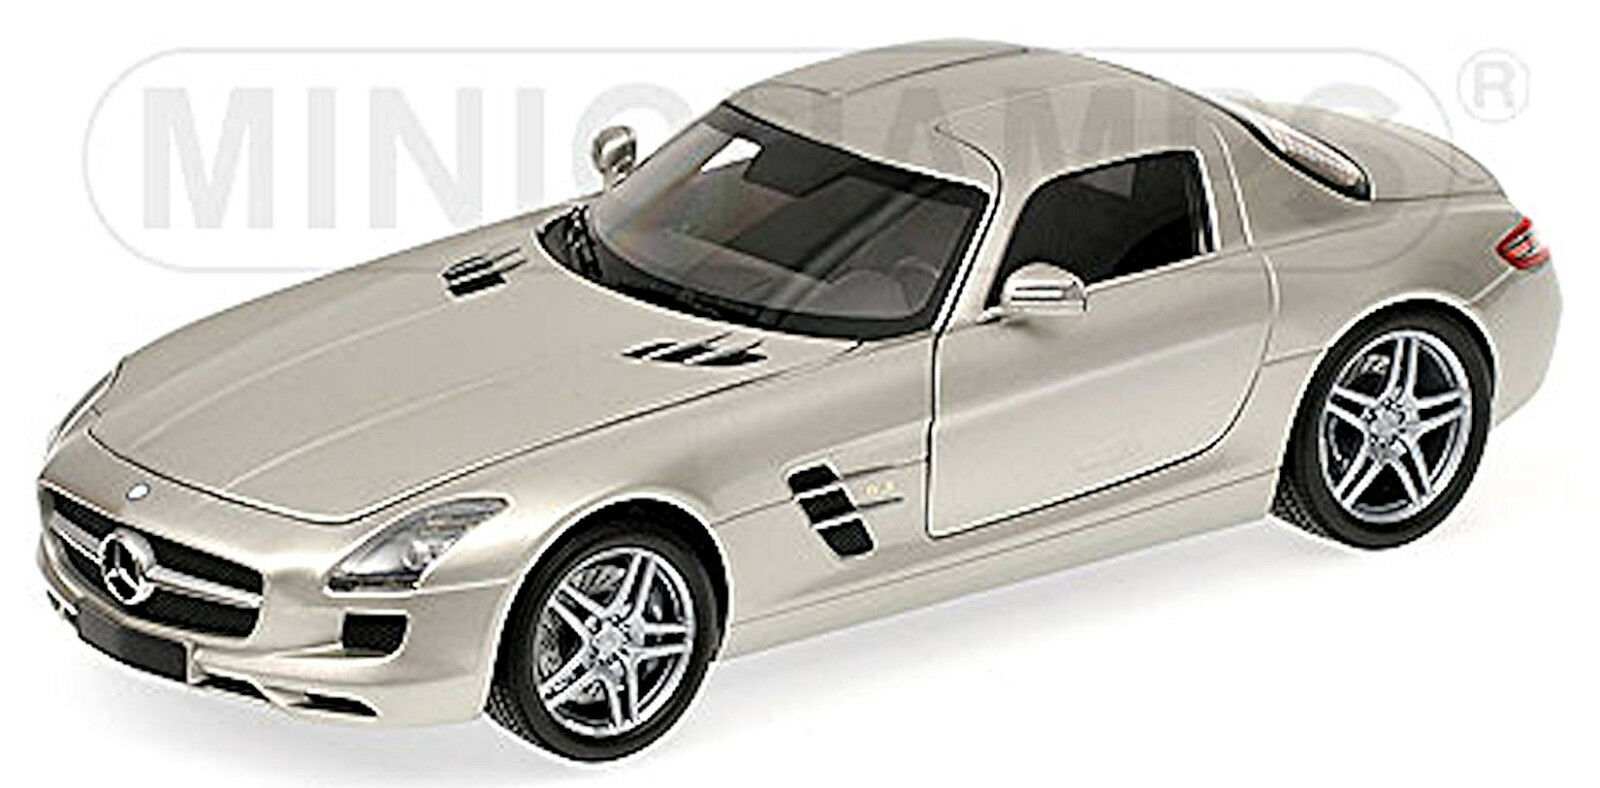 de moda Mercedes Benz SLS AMG Coupé 2009-13 Plata Metálico 1 1 1 18 minichamps  tienda